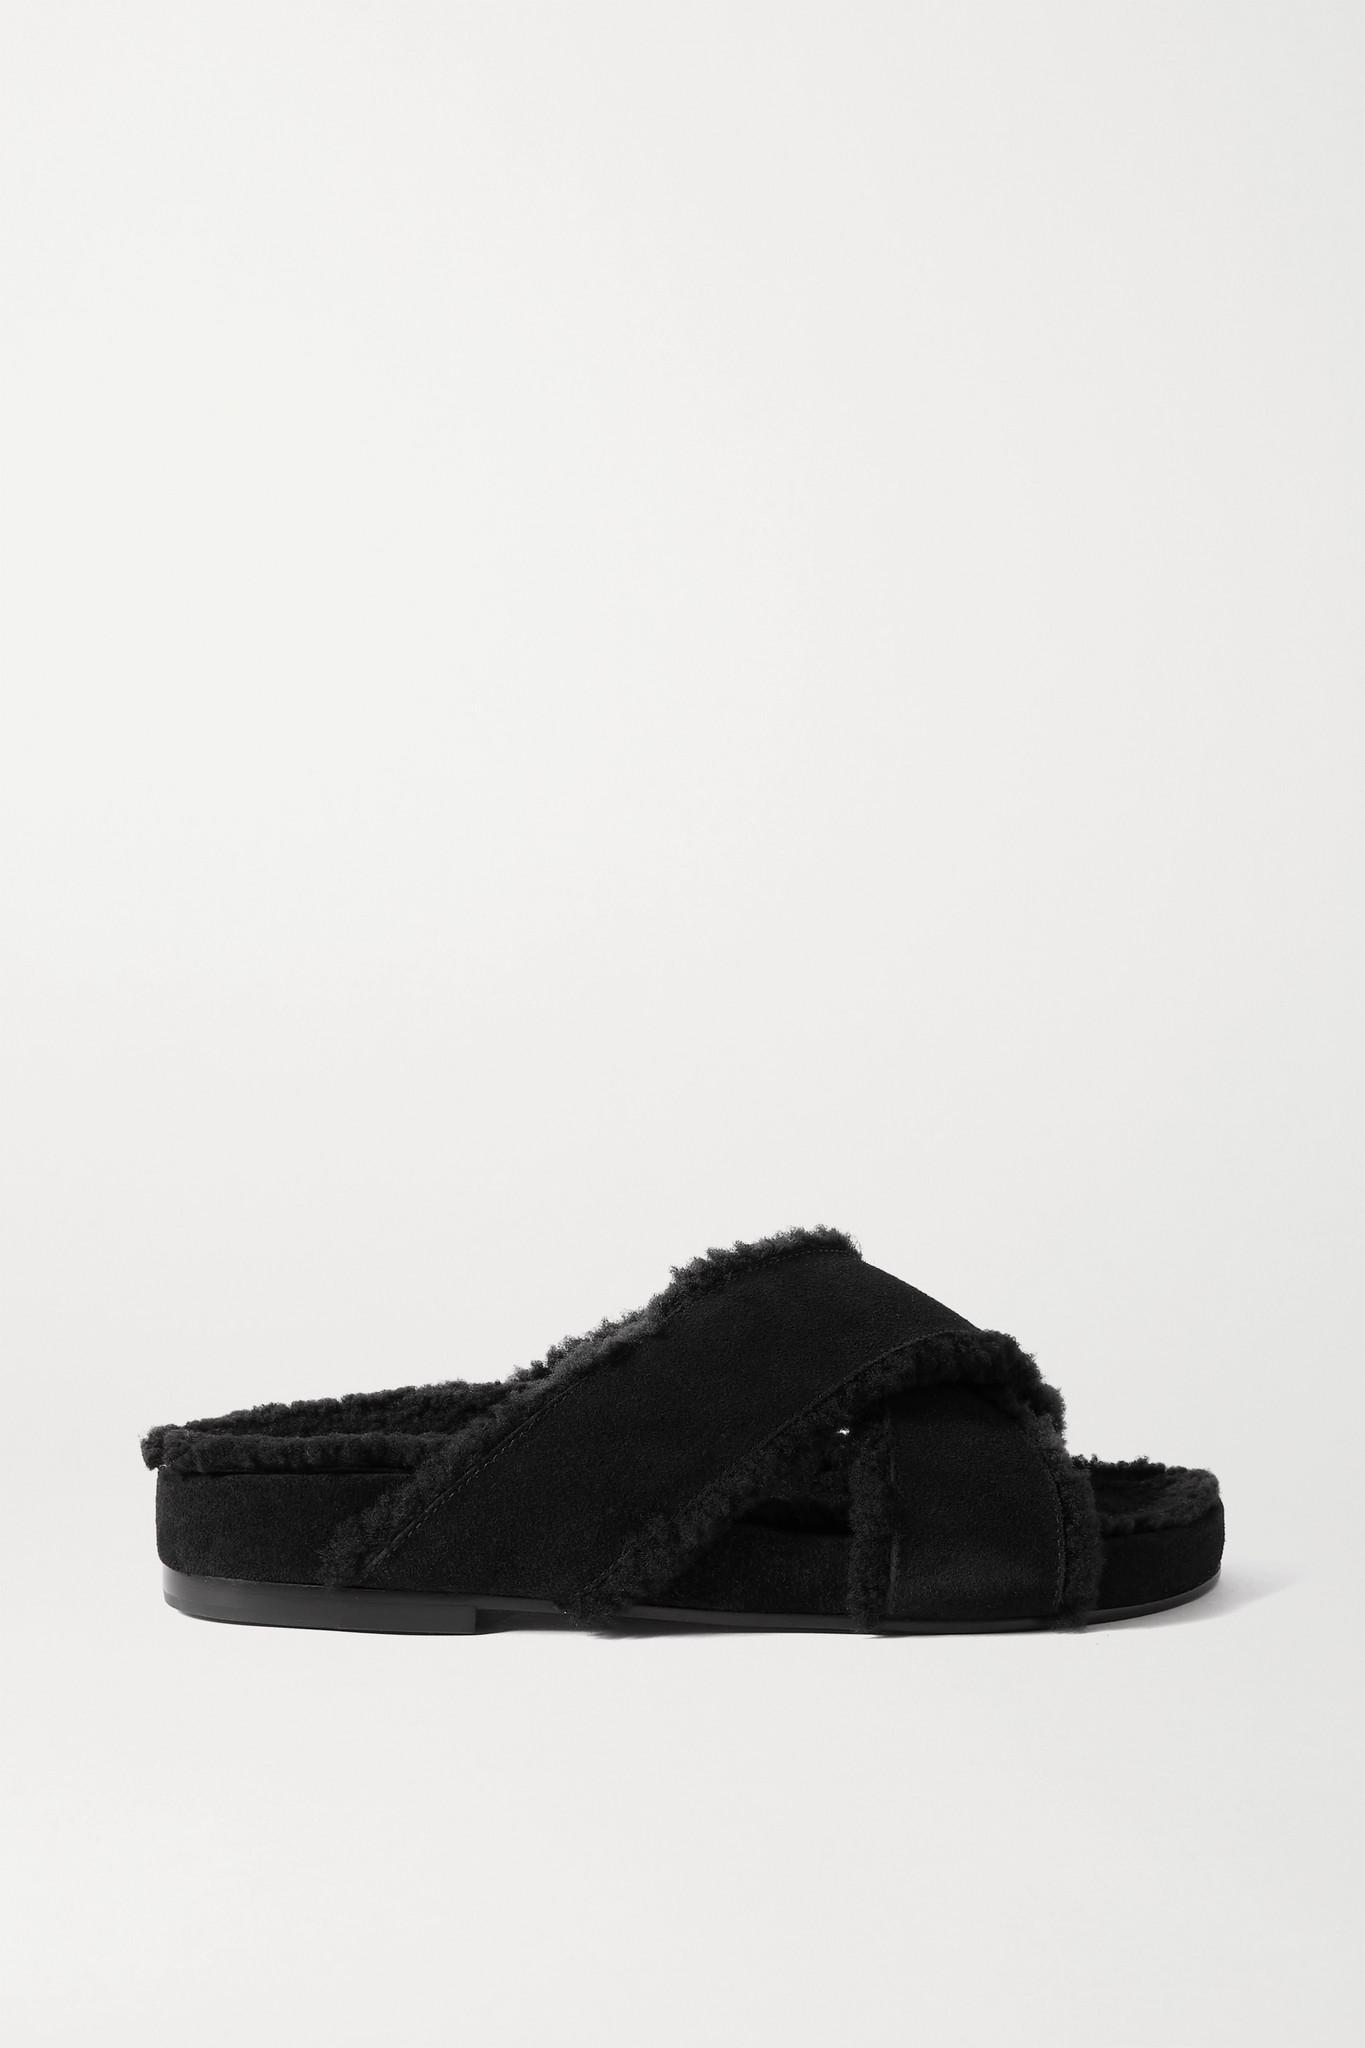 PORTE & PAIRE - 羊毛皮衬里绒面革拖鞋 - 黑色 - IT36